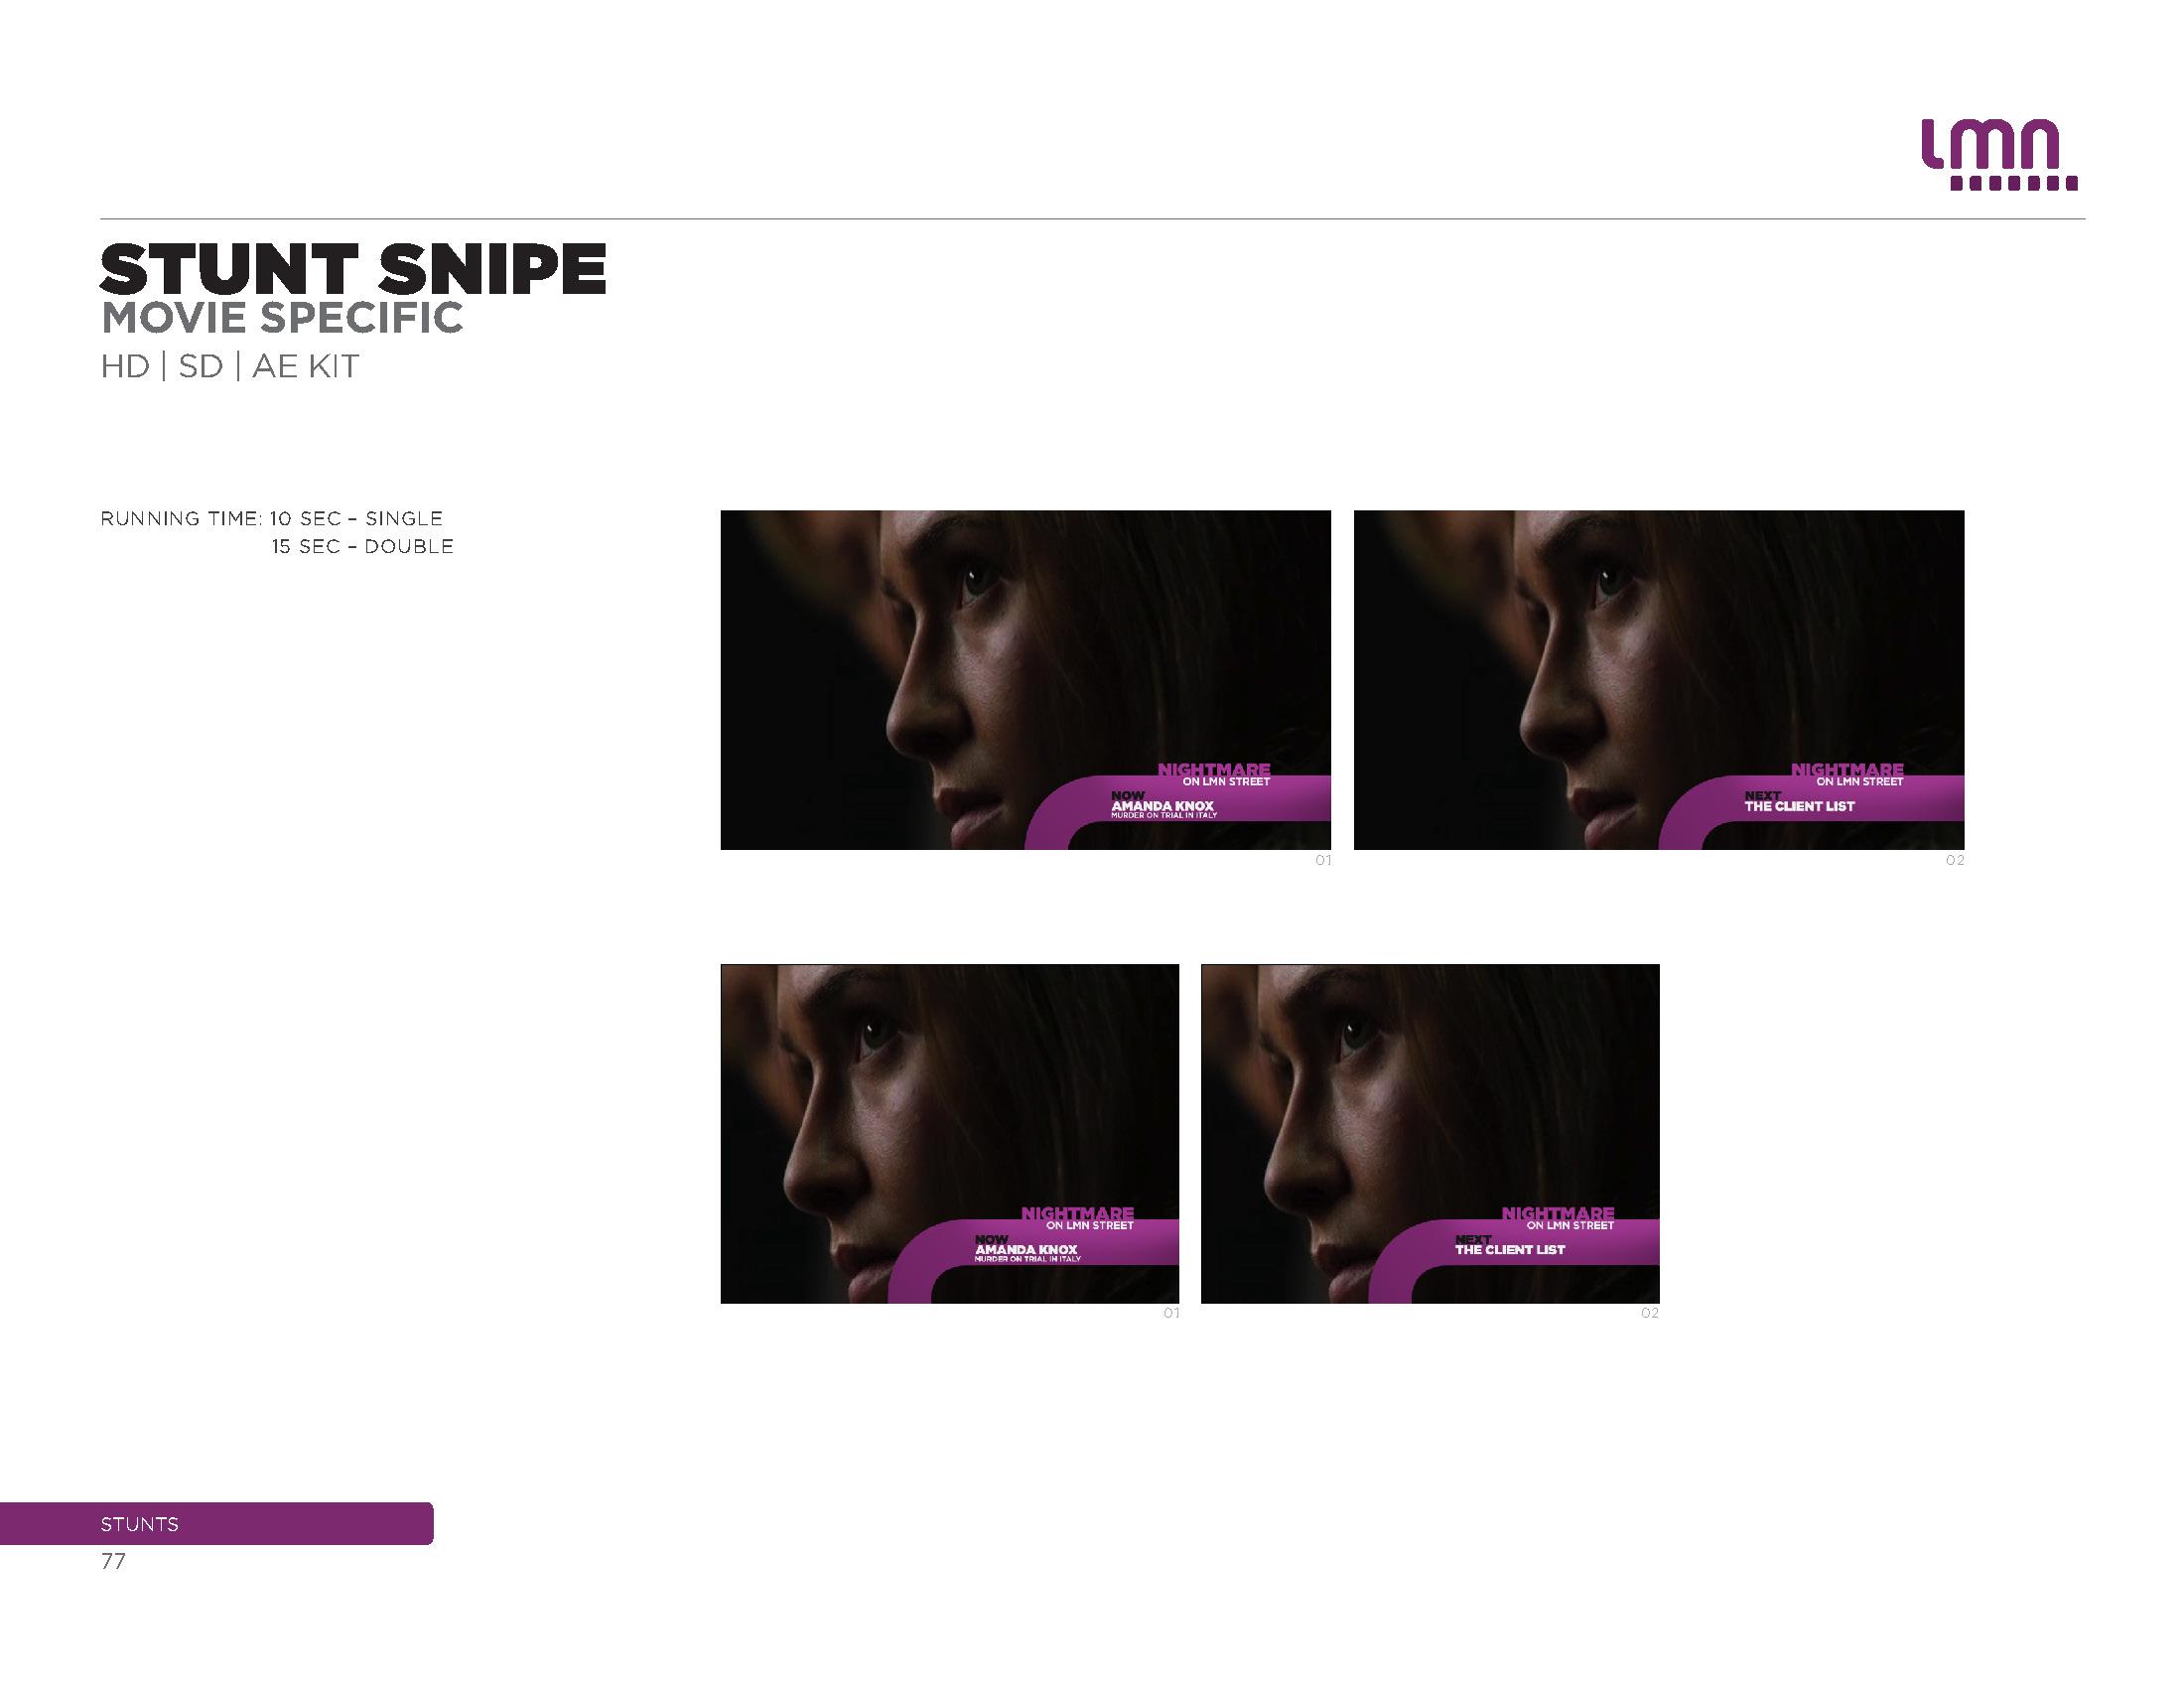 LMN_styleguide_092711_HQ_Page_77.jpg